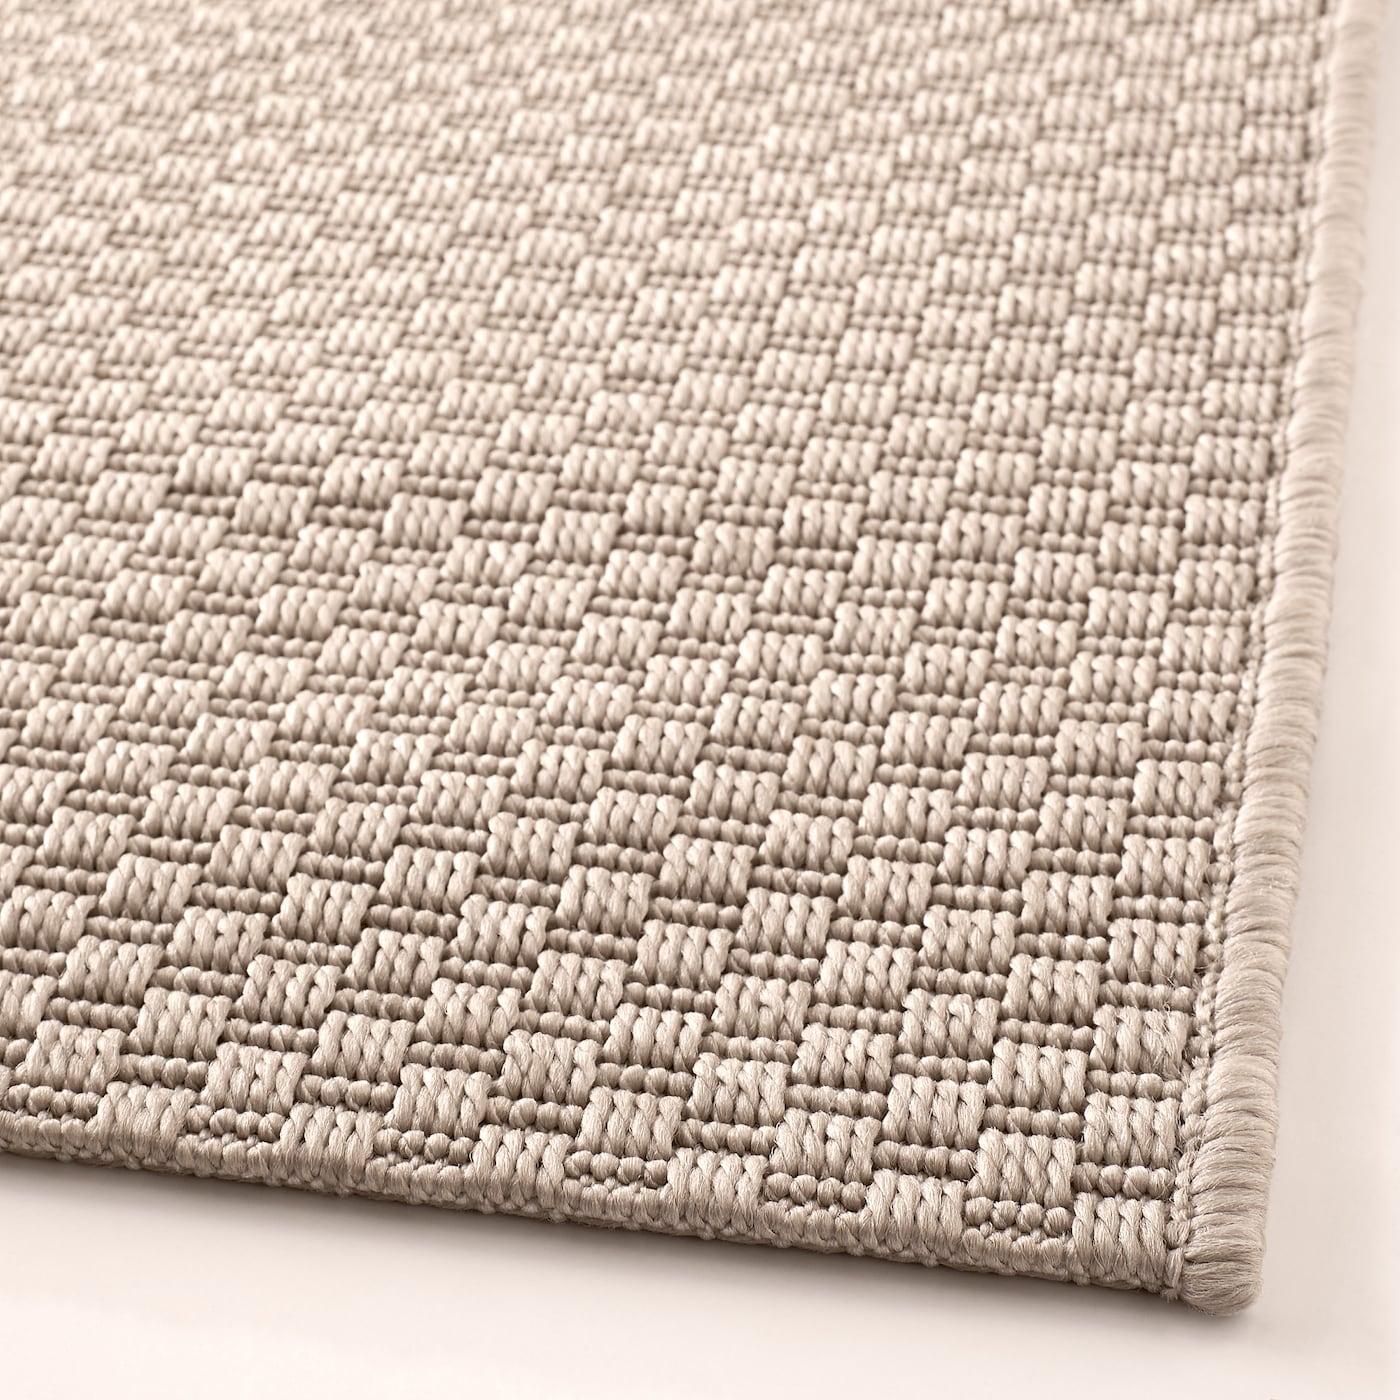 MORUM Alfombra intexterior, intext beige, 160x230 cm IKEA